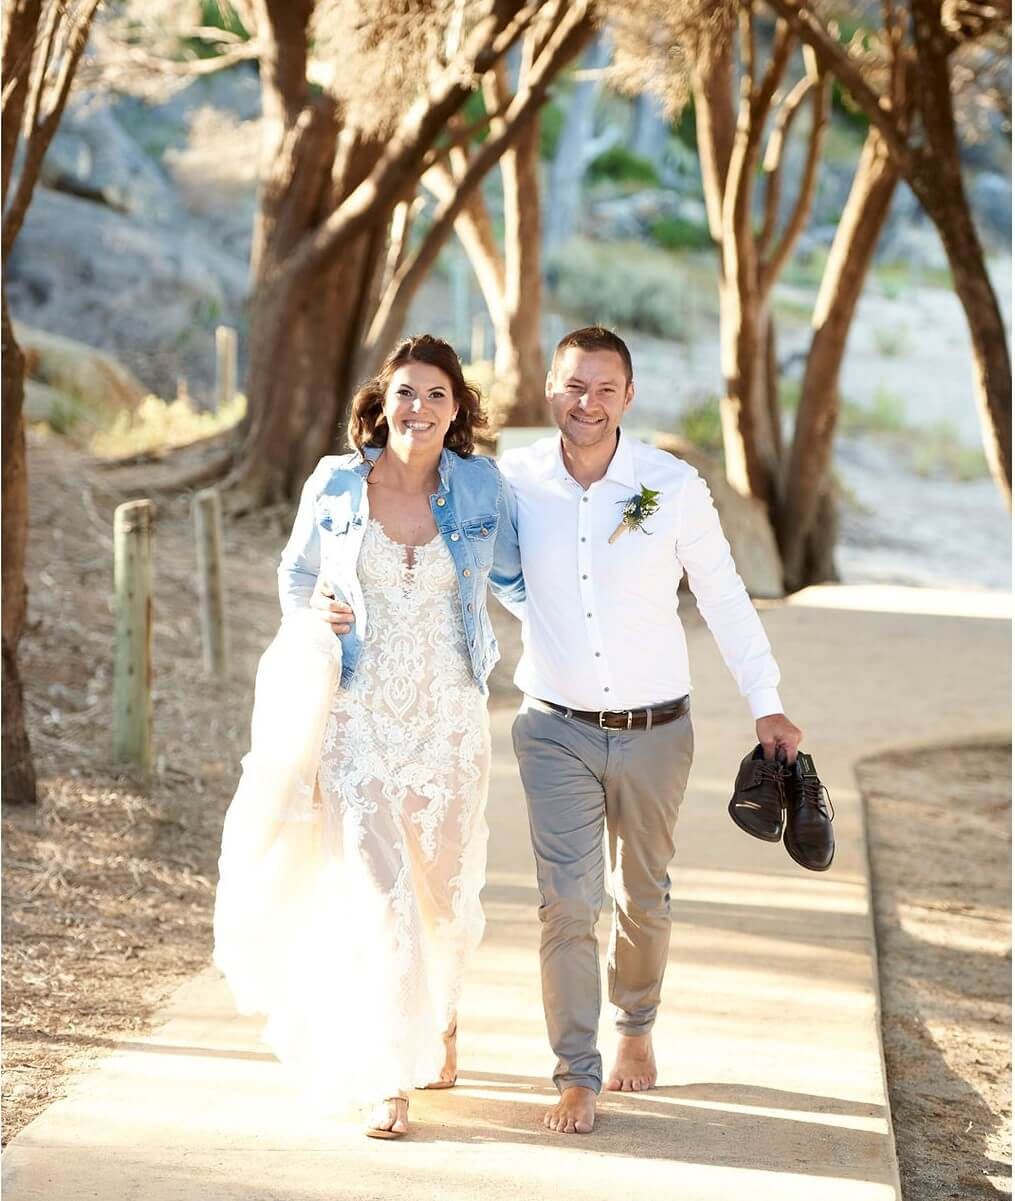 https://www.lovebirdceremonies.com.au/wp-content/uploads/2020/07/4.2-Denim-Jacket-Eva-Rene.jpg